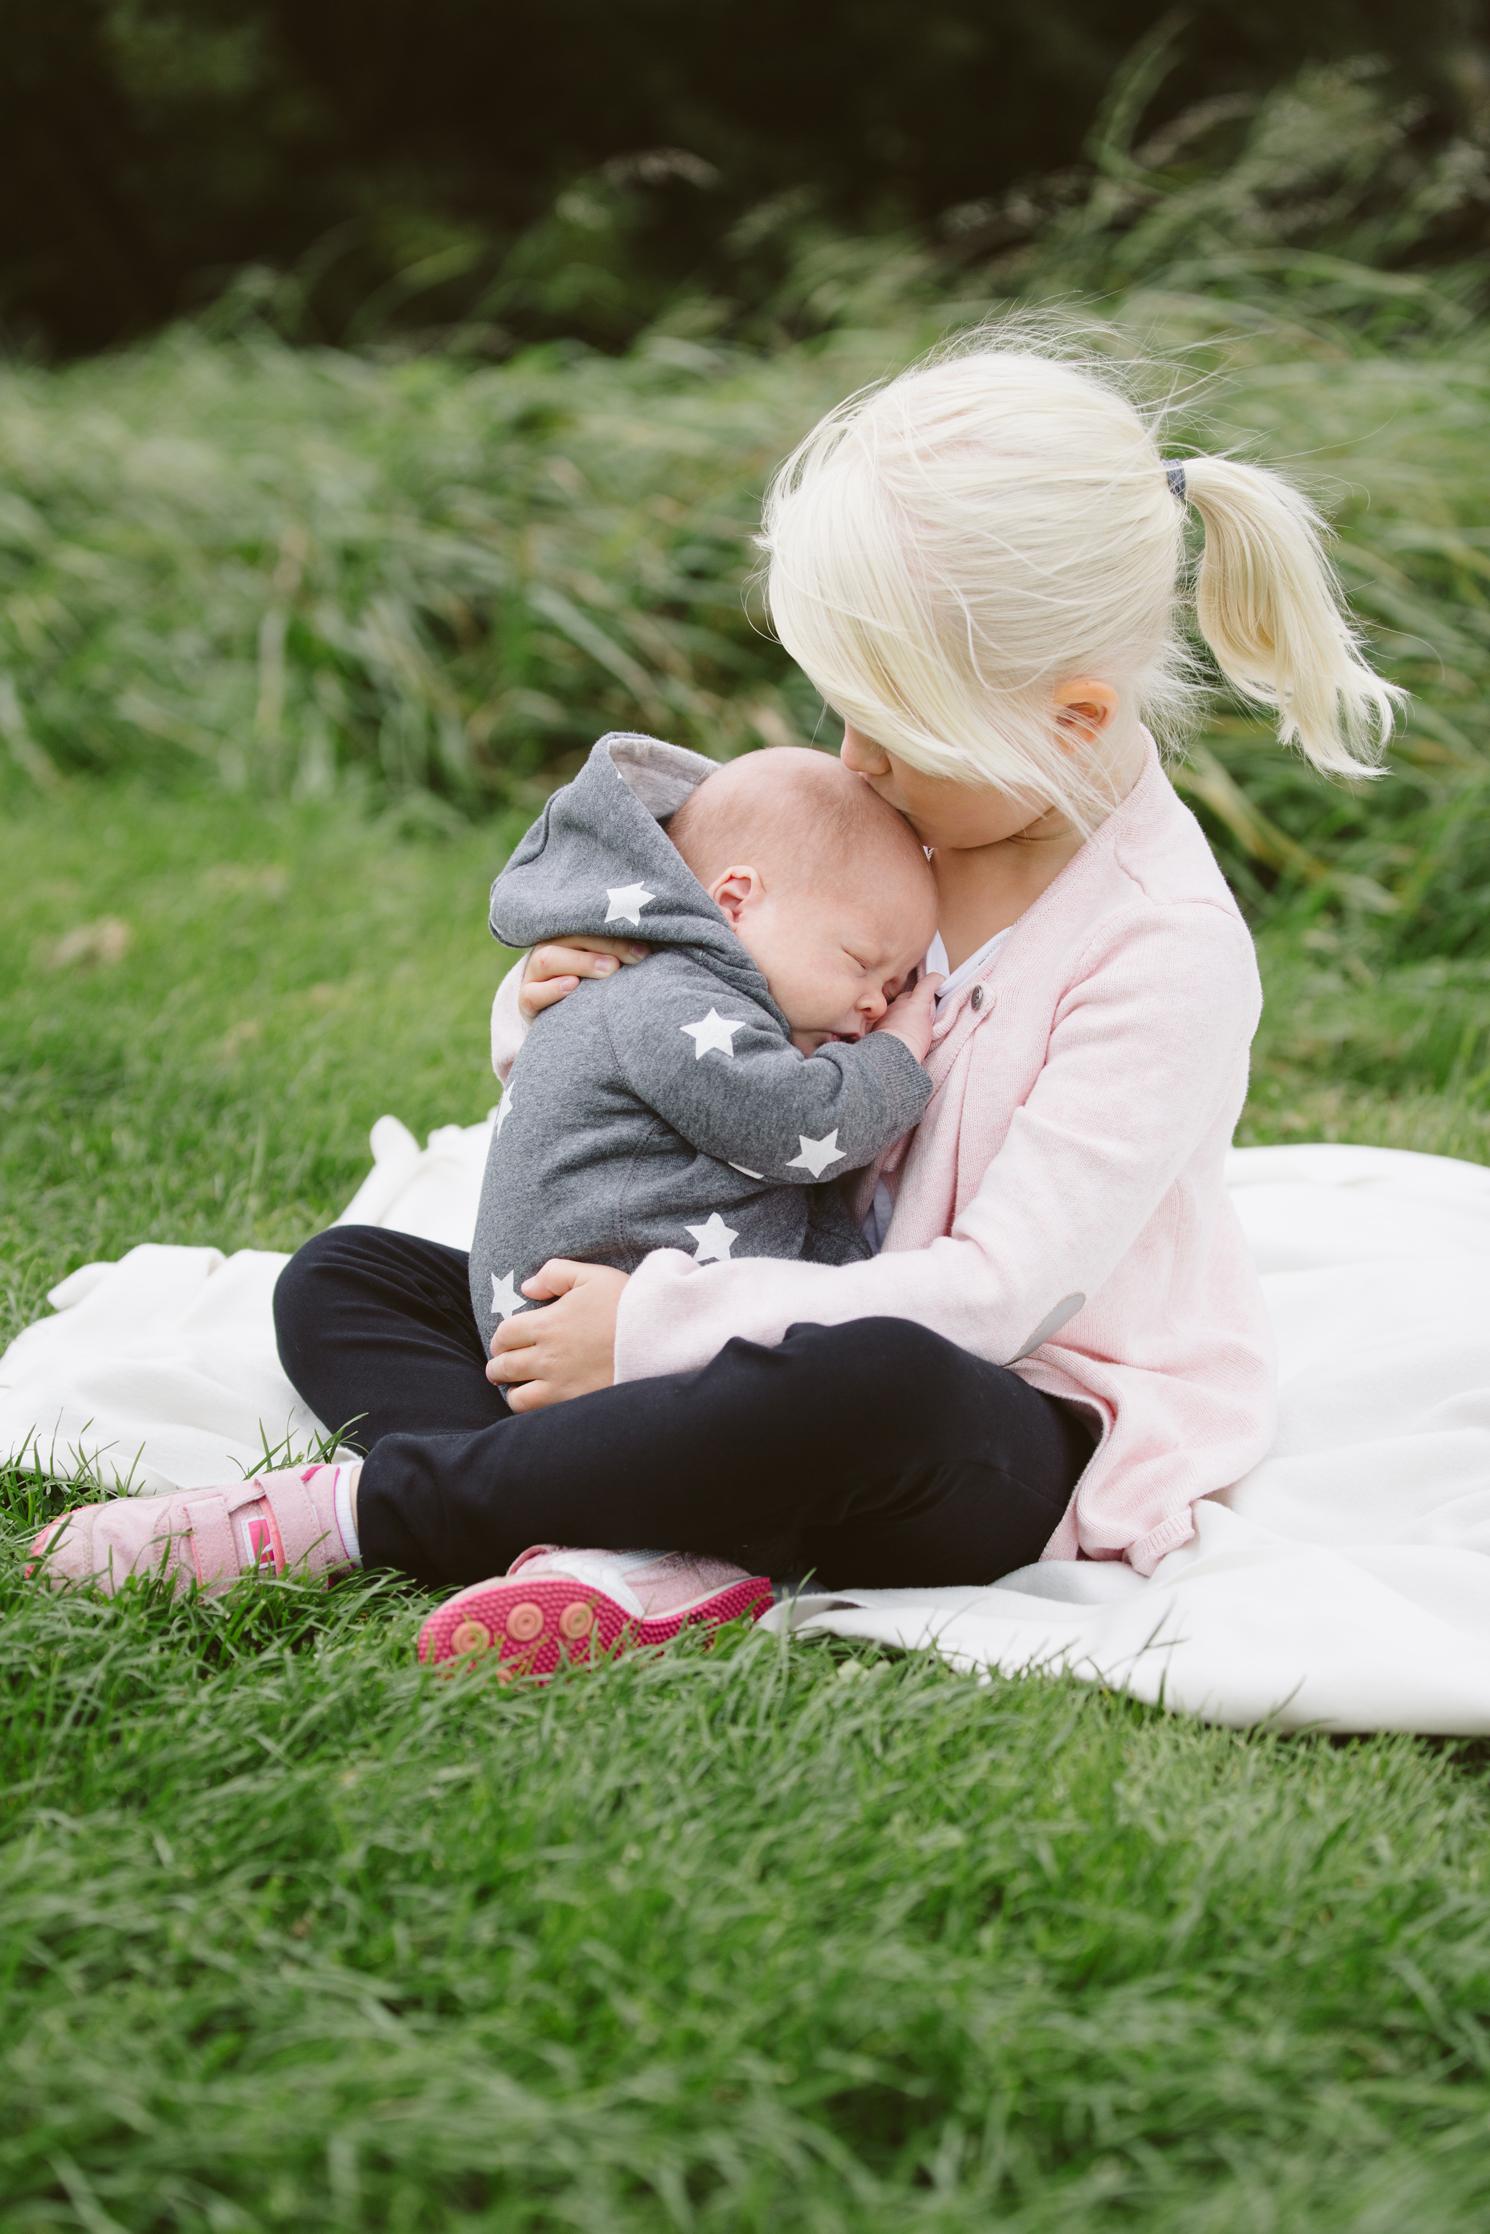 familjefotografering-barn-syskonfotografering-lillebror-storasyster-maria-o-photo-klagerup-6